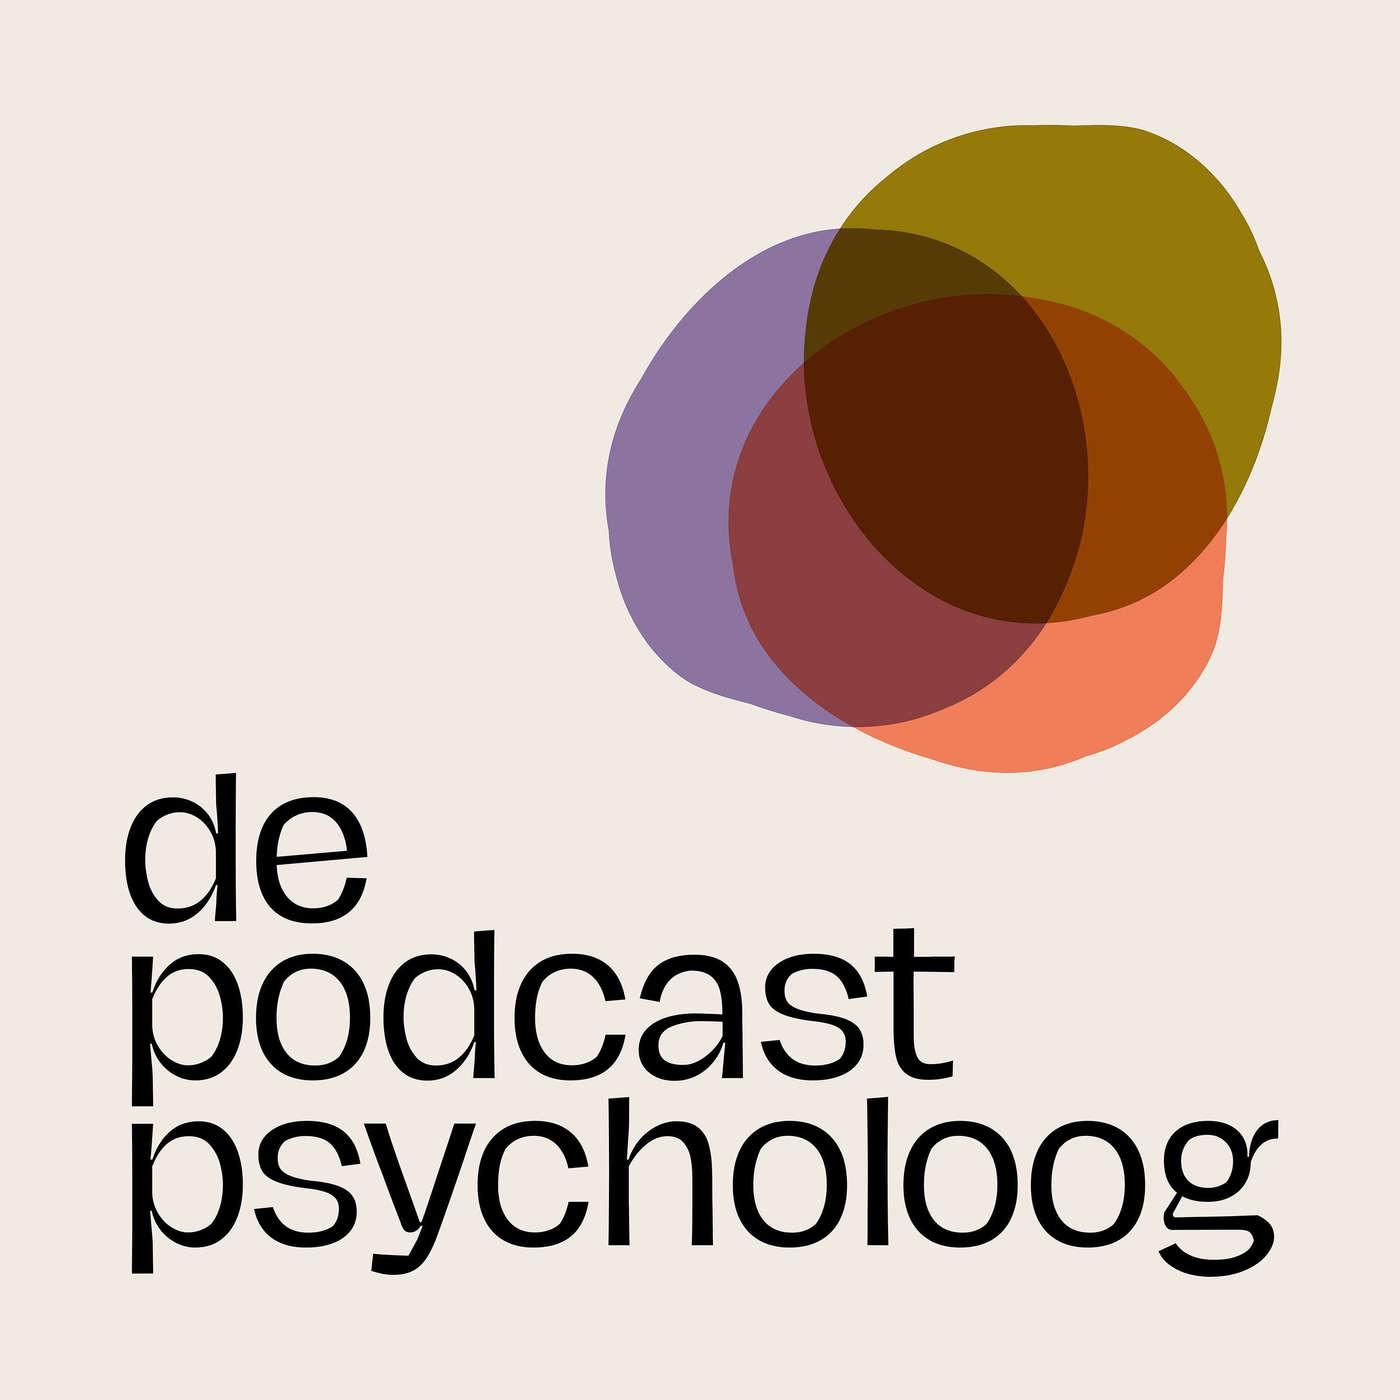 De Podcast Psycholoog logo